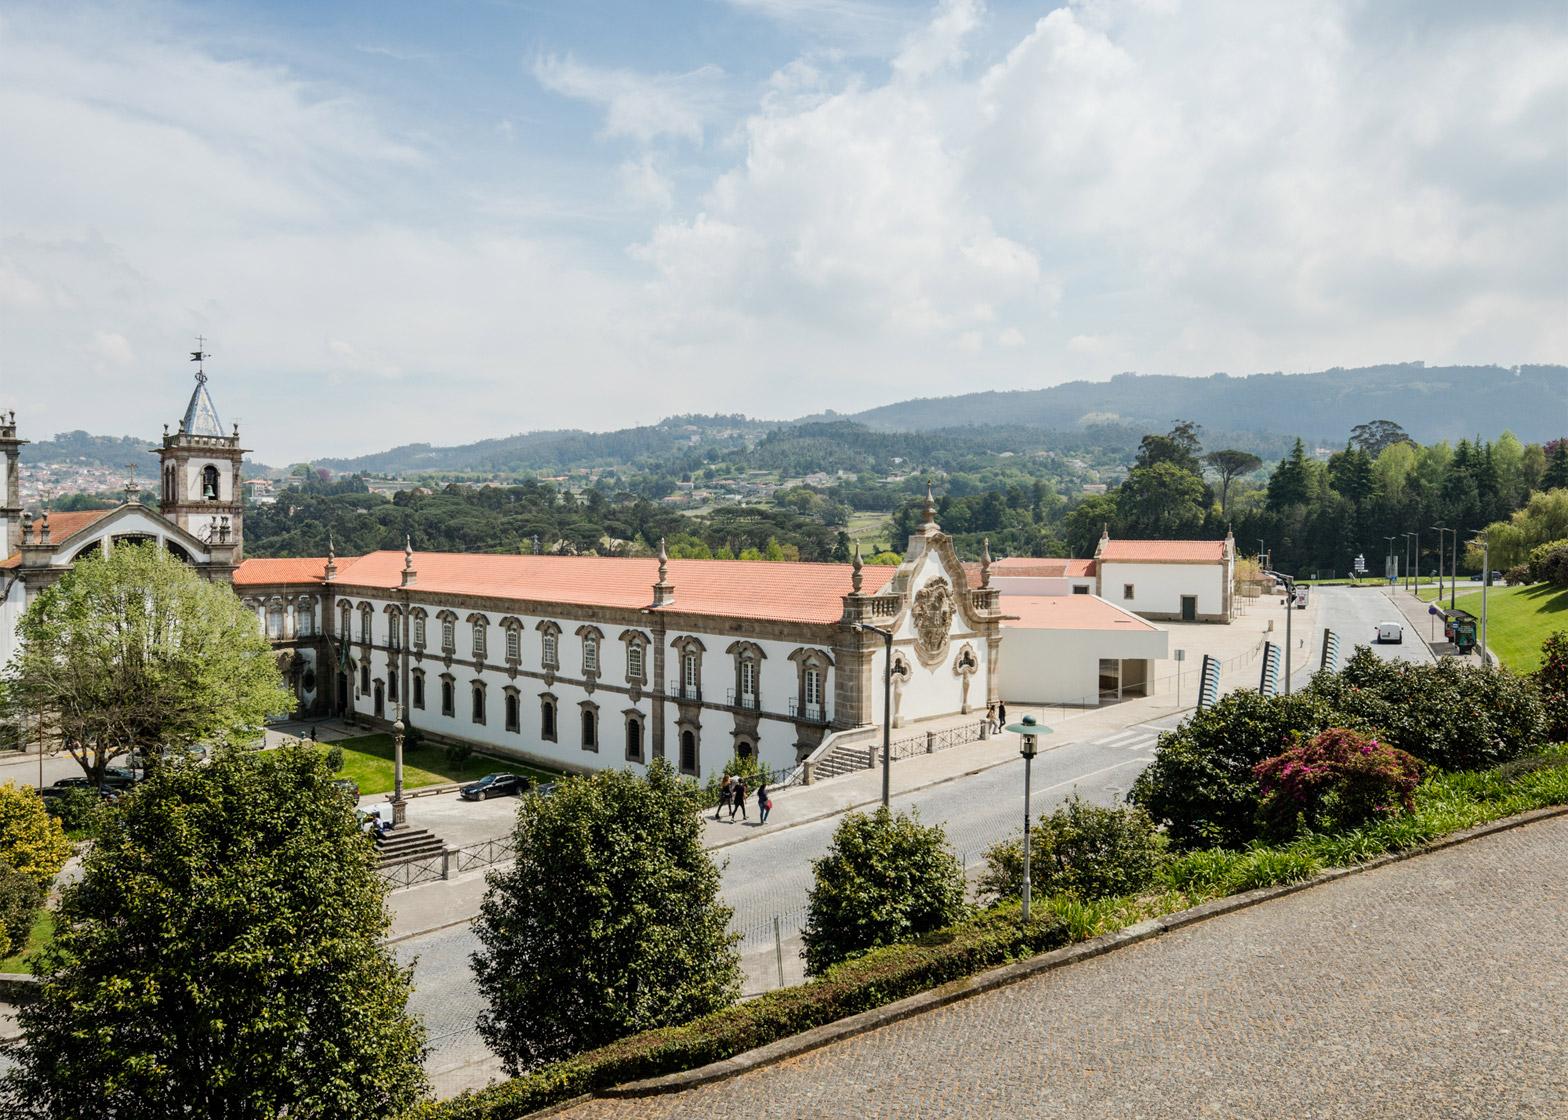 2-premiados-arquitetos-portugueses-se-unem-para-reformar-museu